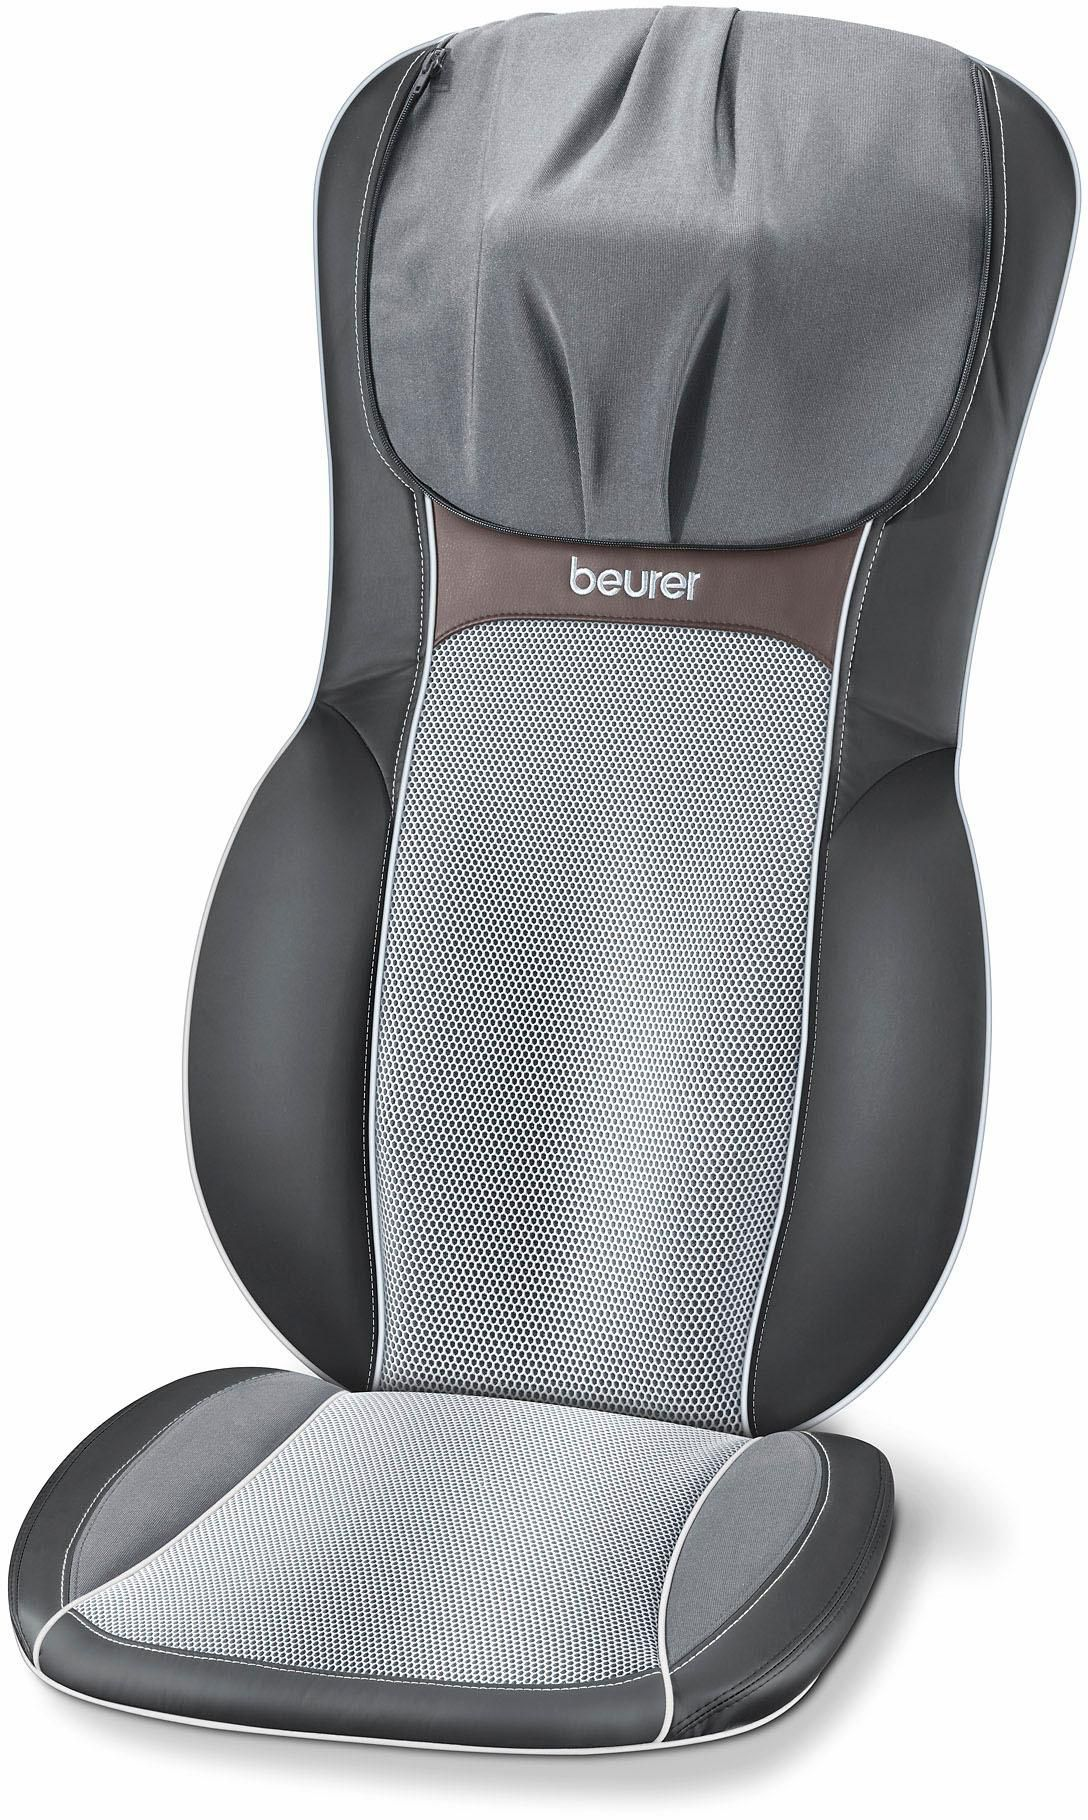 BEURER Beurer, Shiatsu-Massageauflage, MG 295